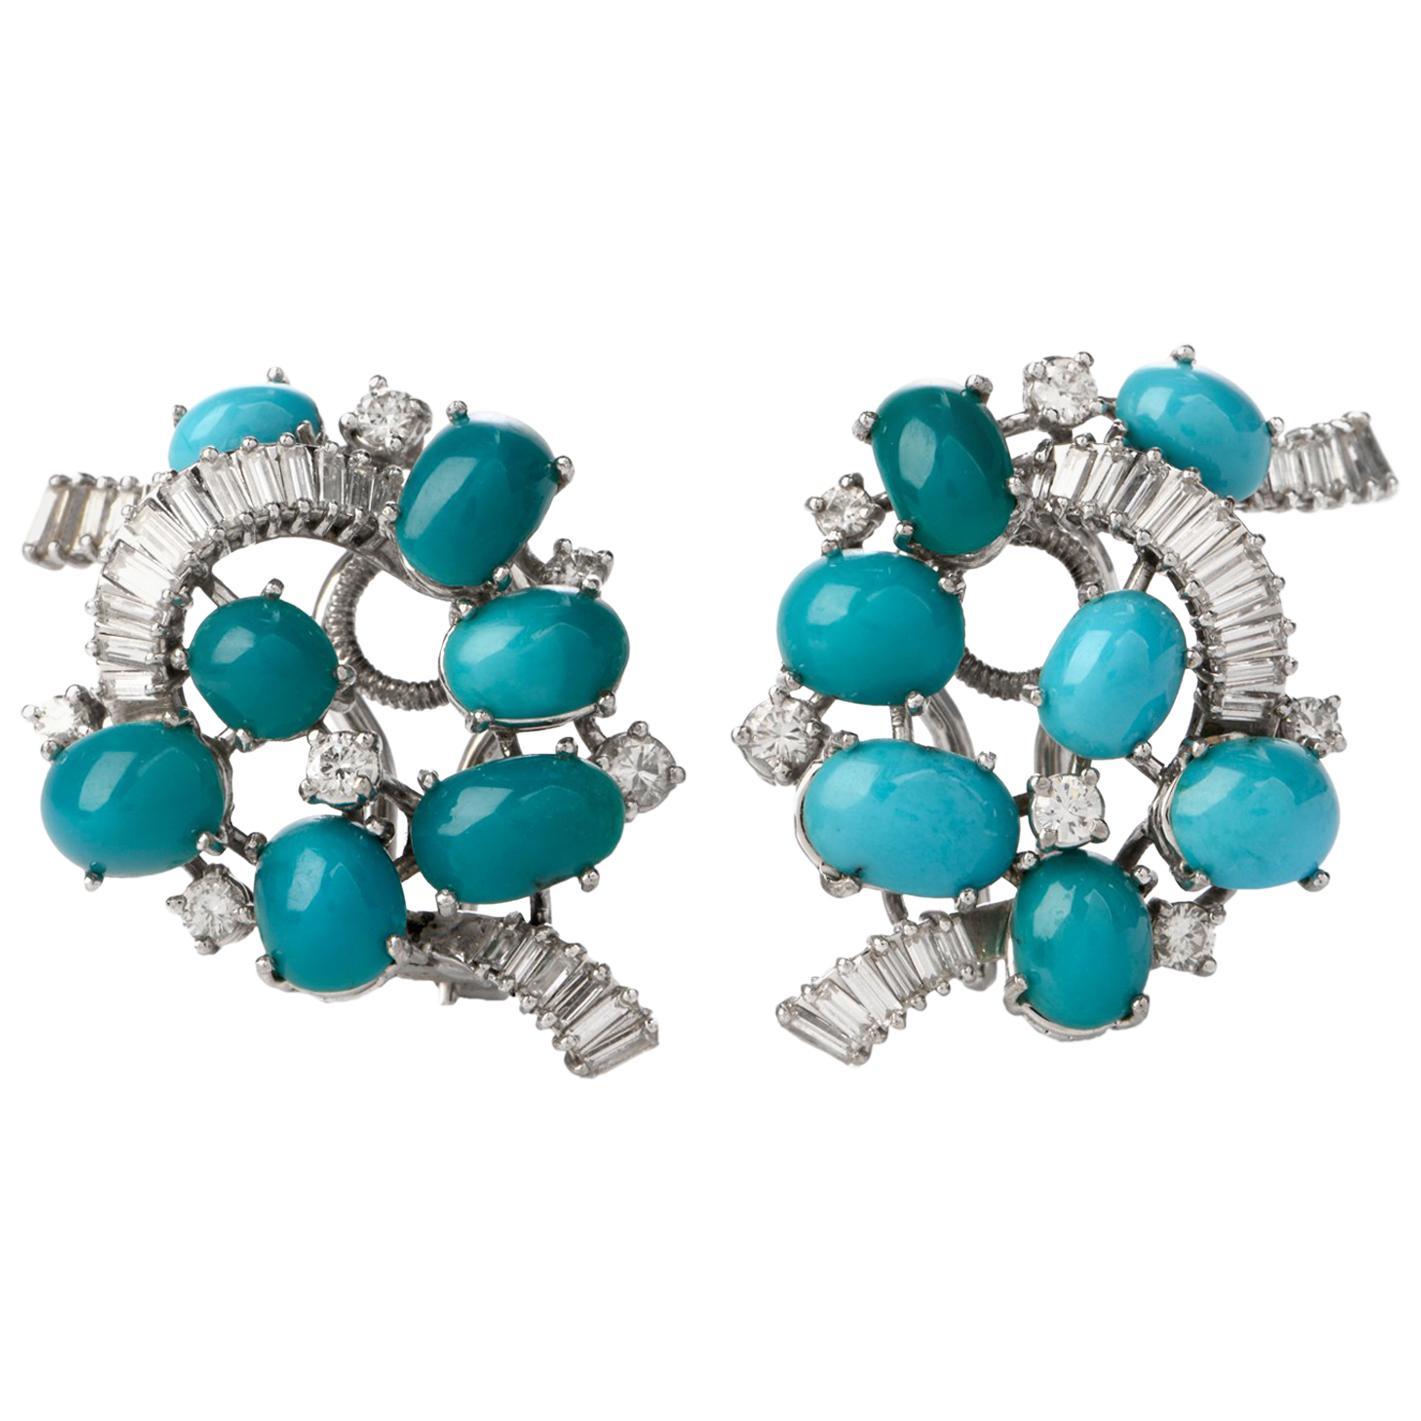 Gübelin Vintage Baguette Diamond Turquoise Gold Clip-On Earrings